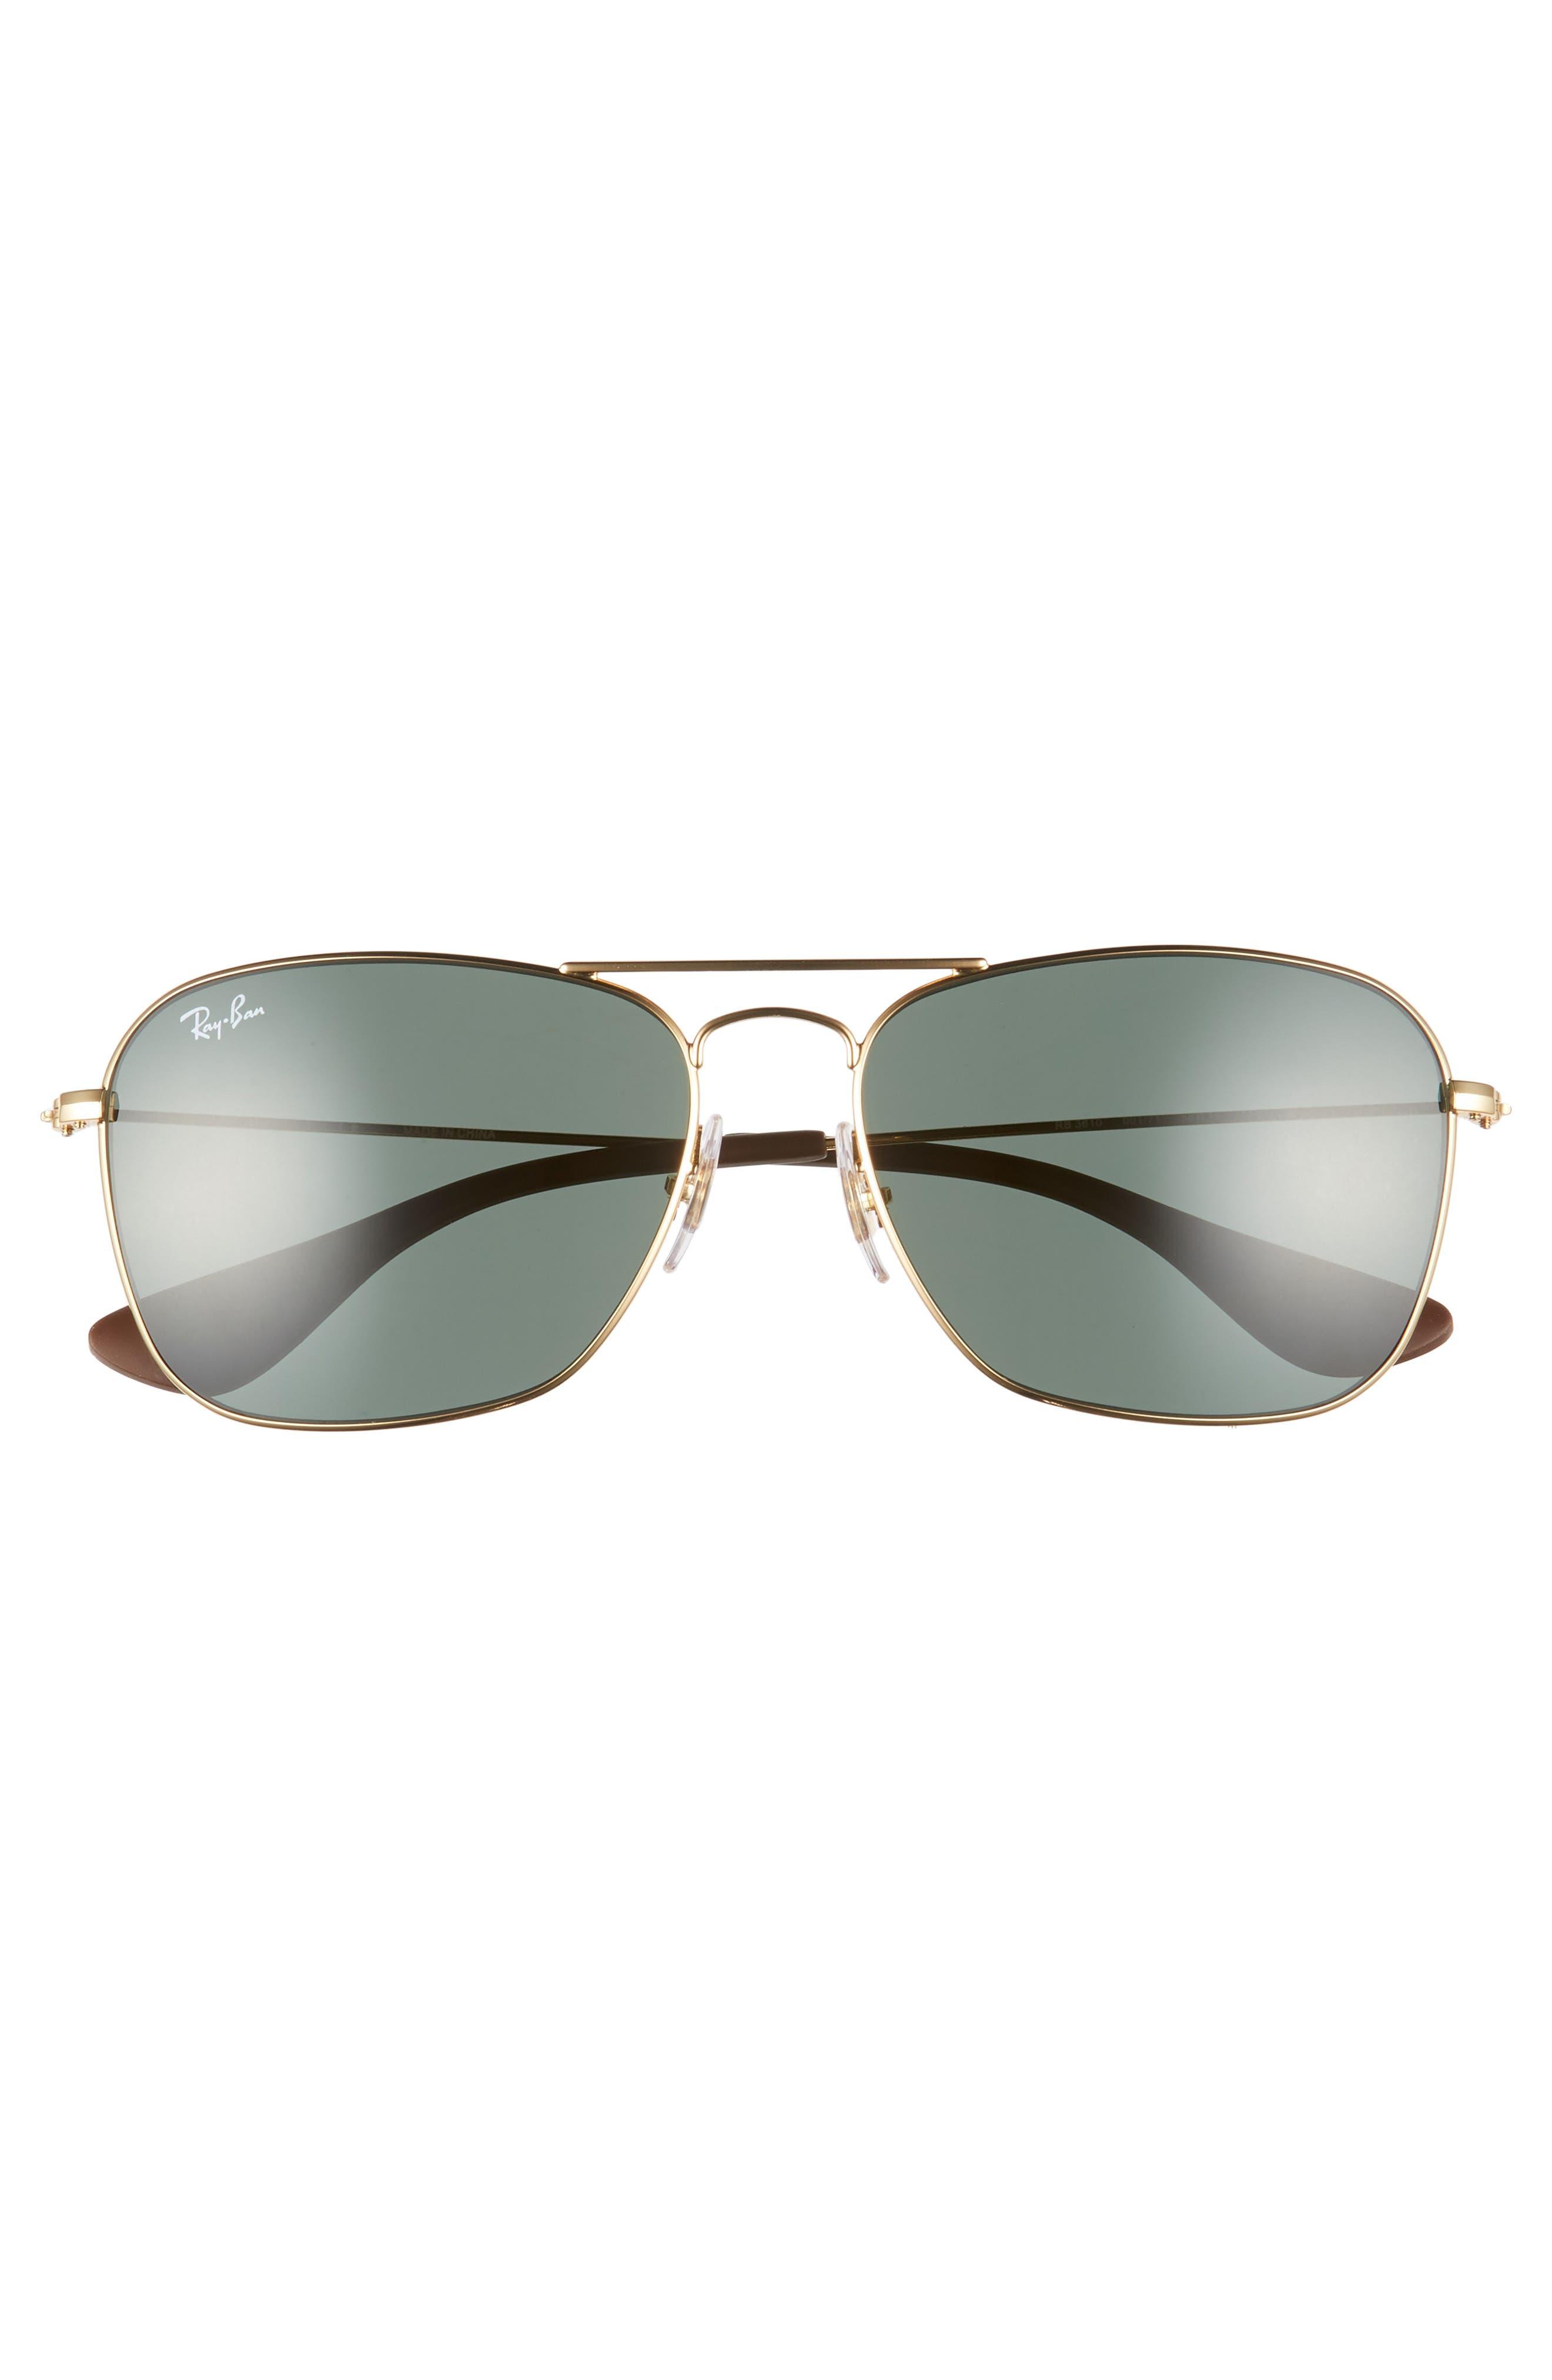 58mm Polarized Navigator Sunglasses,                             Alternate thumbnail 2, color,                             GOLD